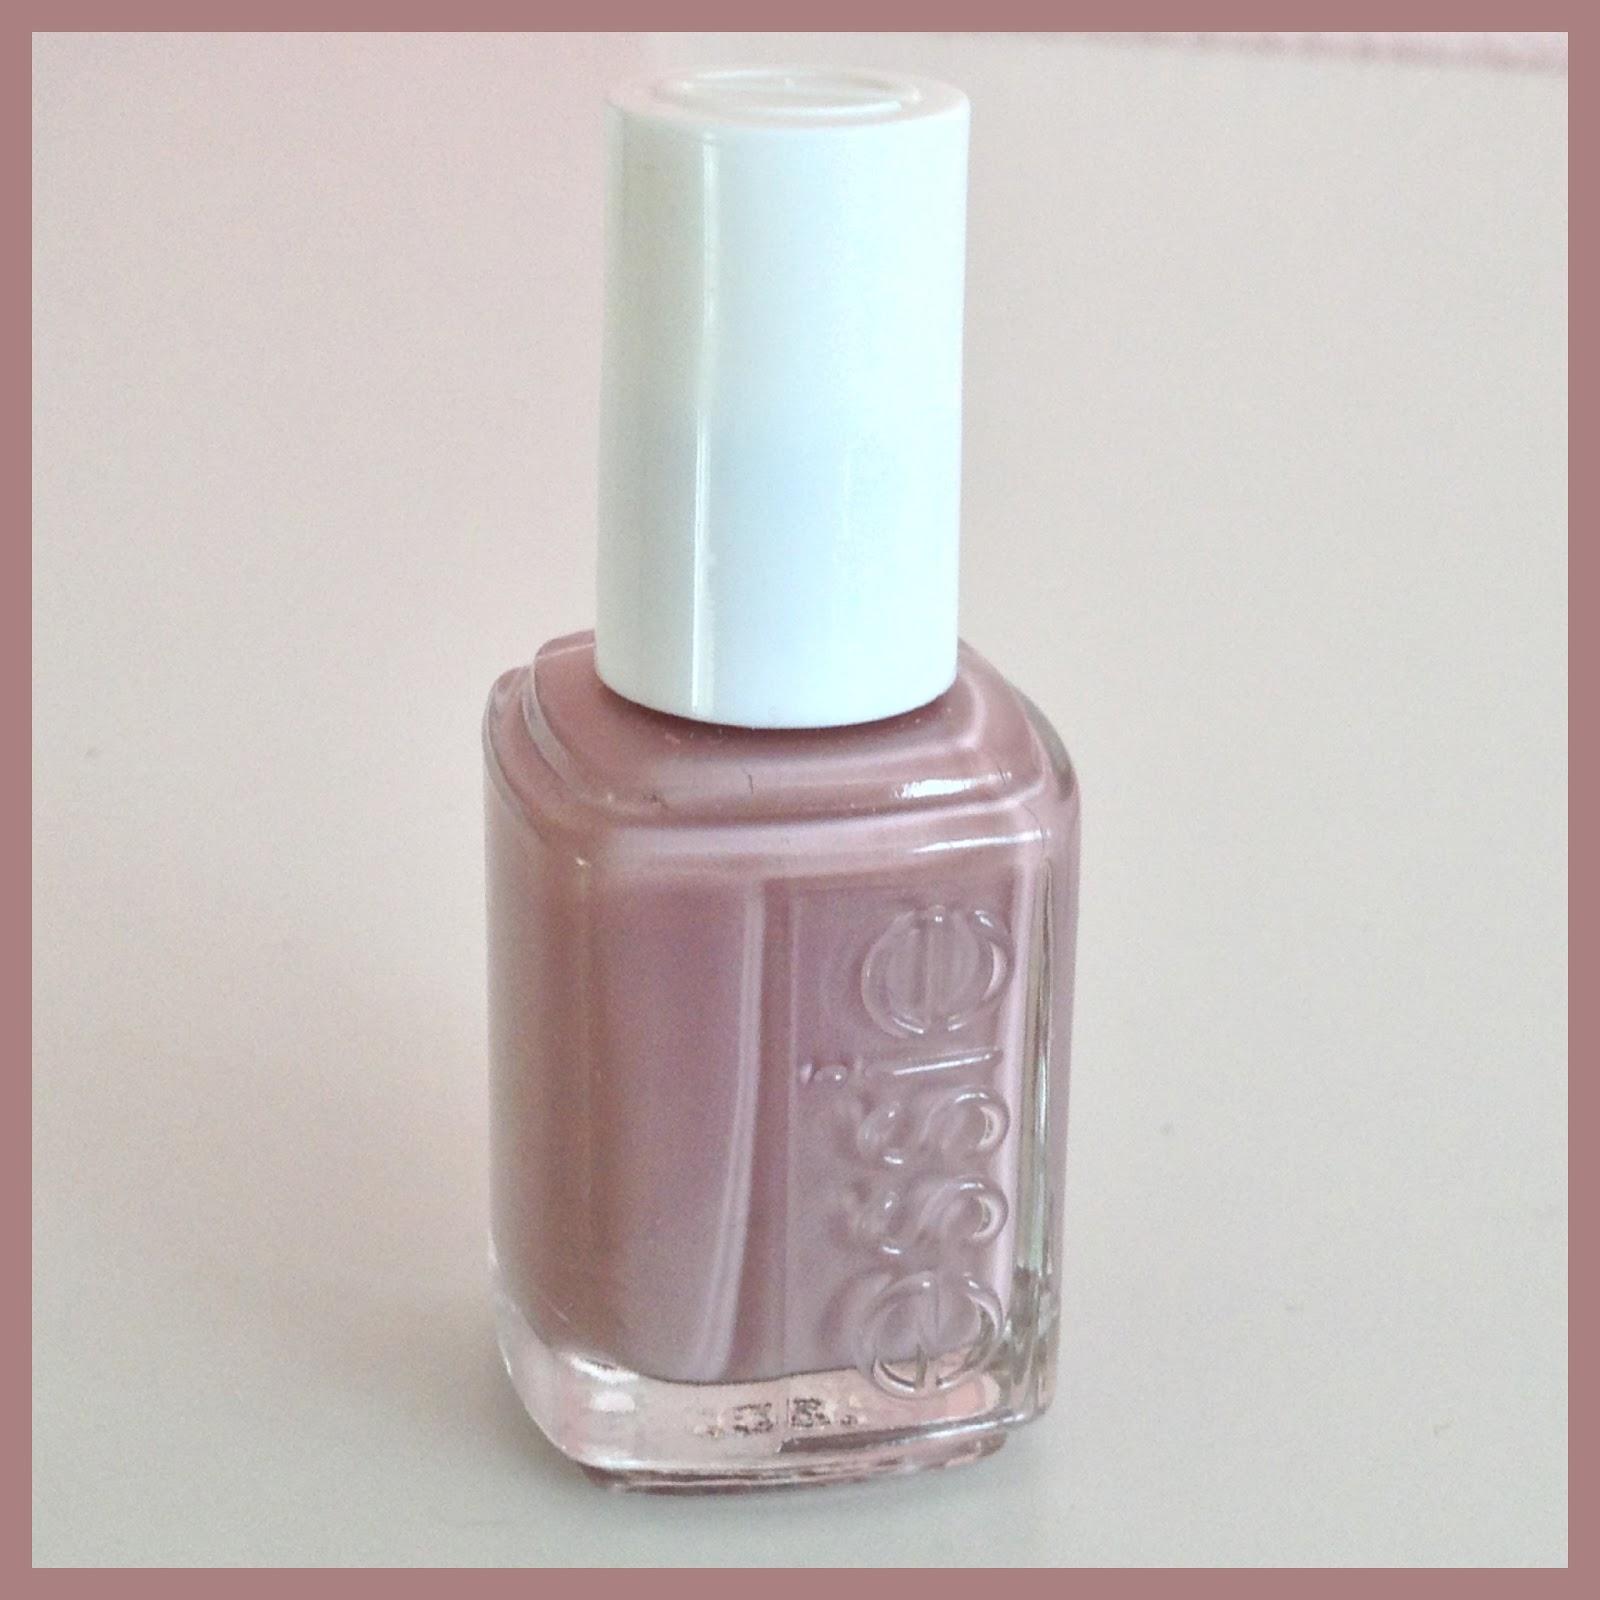 Essie Nail Polish Bottle Size - Best Nail 2018